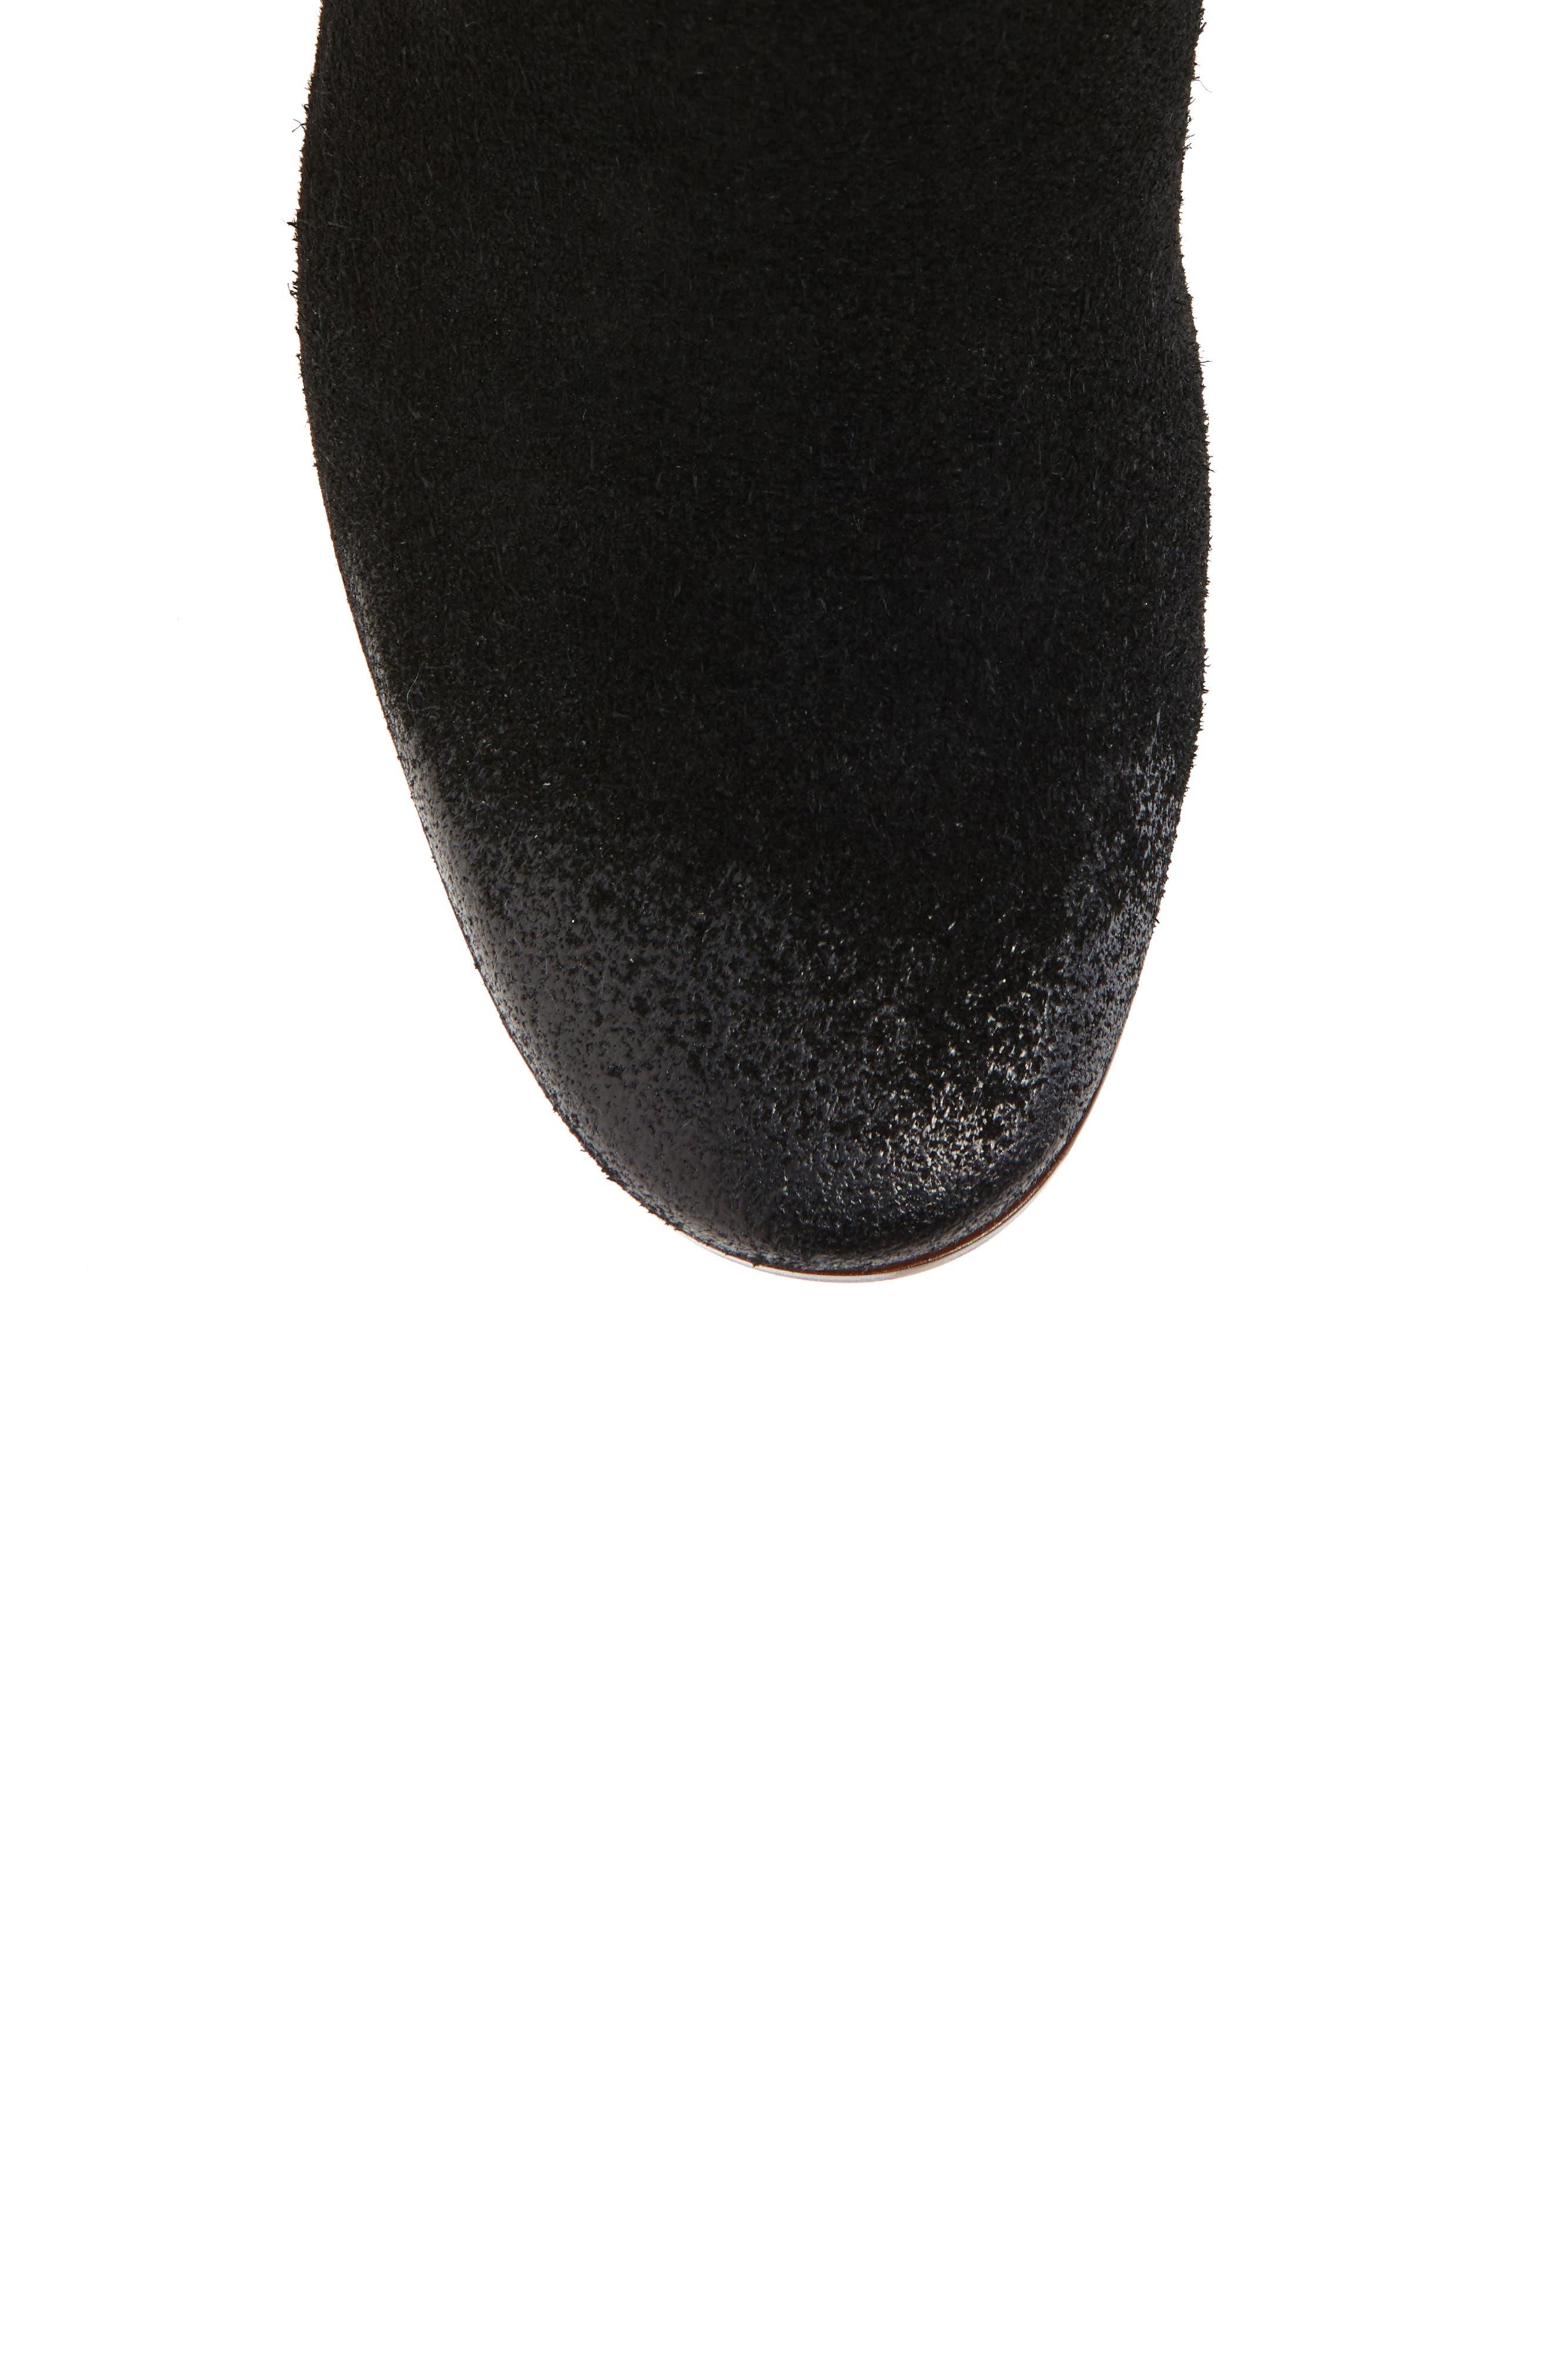 SAM EDELMAN, Camellia Tall Boot, Alternate thumbnail 5, color, 002